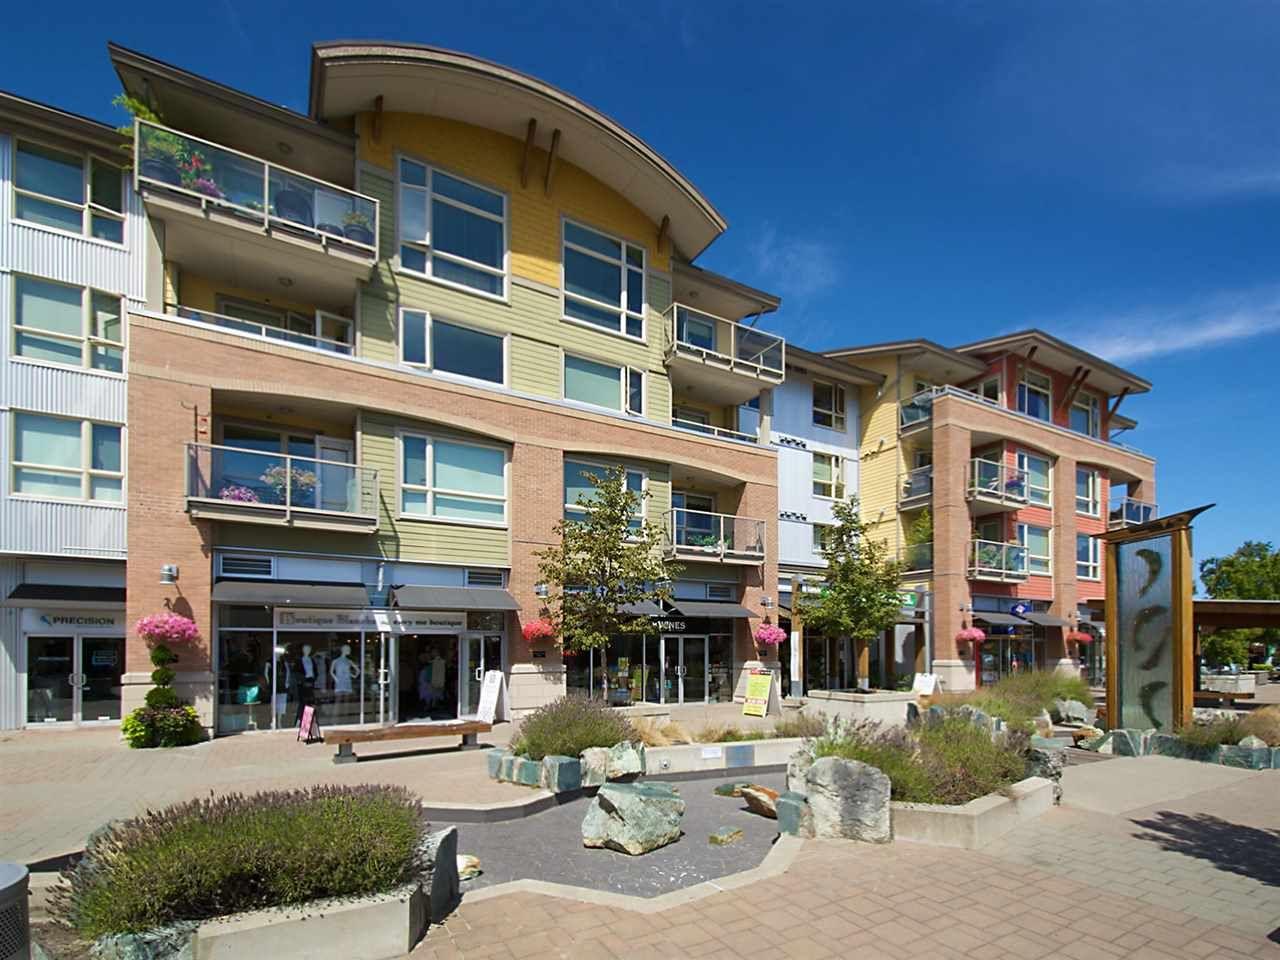 Main Photo: 410 1315 56 STREET in Delta: Cliff Drive Condo for sale (Tsawwassen)  : MLS®# R2138848